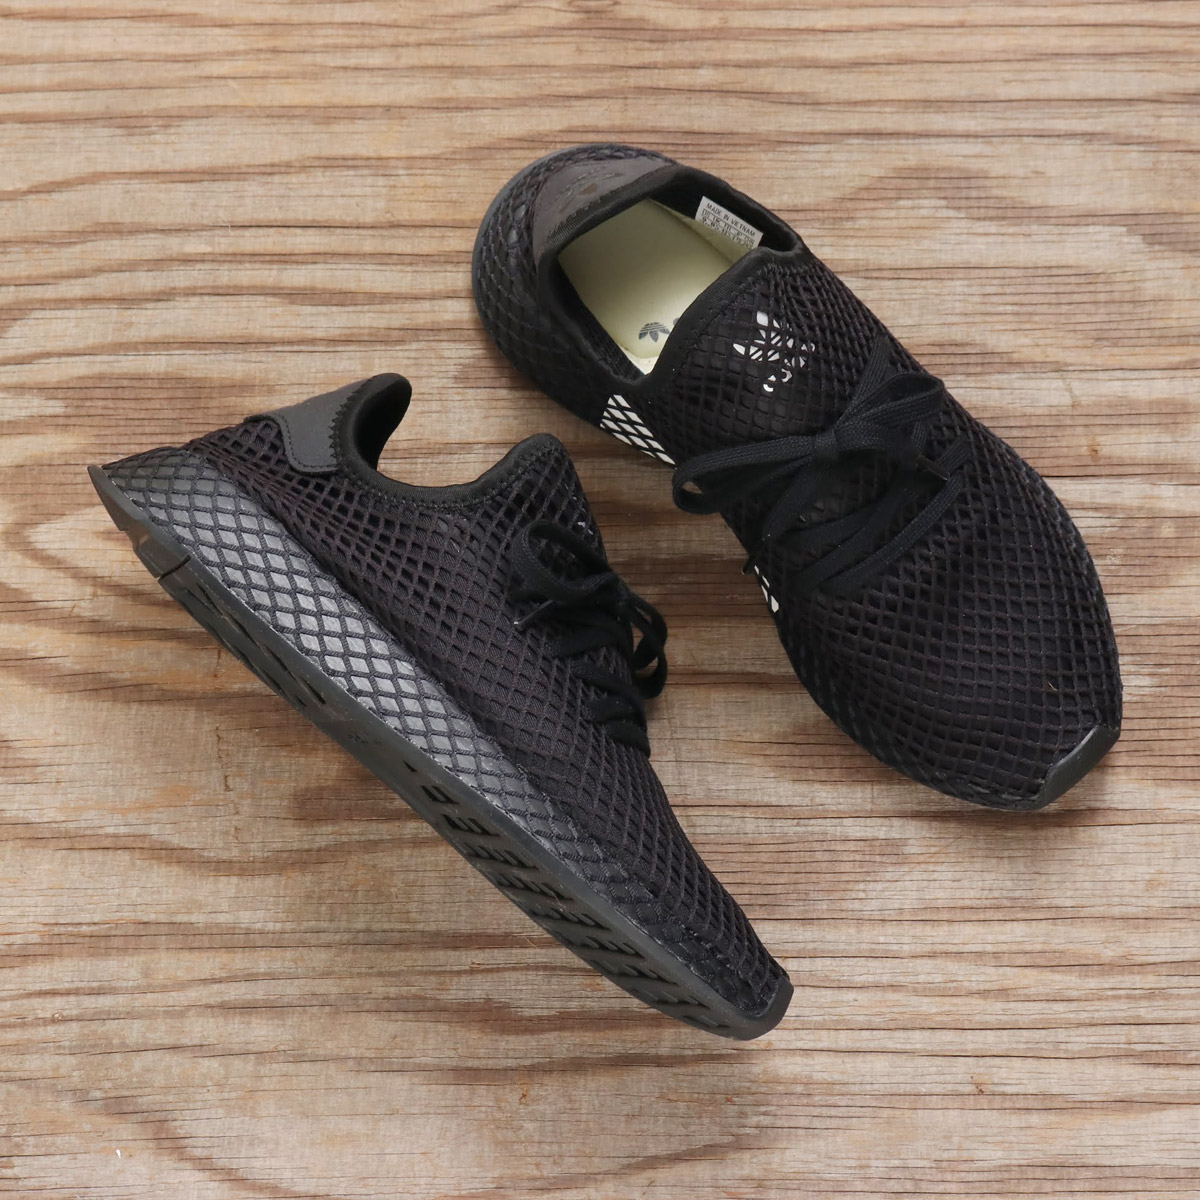 adidas Originals DEERUPT RUNNER(アディダス オリジナルス ディラプトランナー)CORE BLACK/CORE BLACK/RUNNING WHITE【メンズ スニーカー】18FA-I